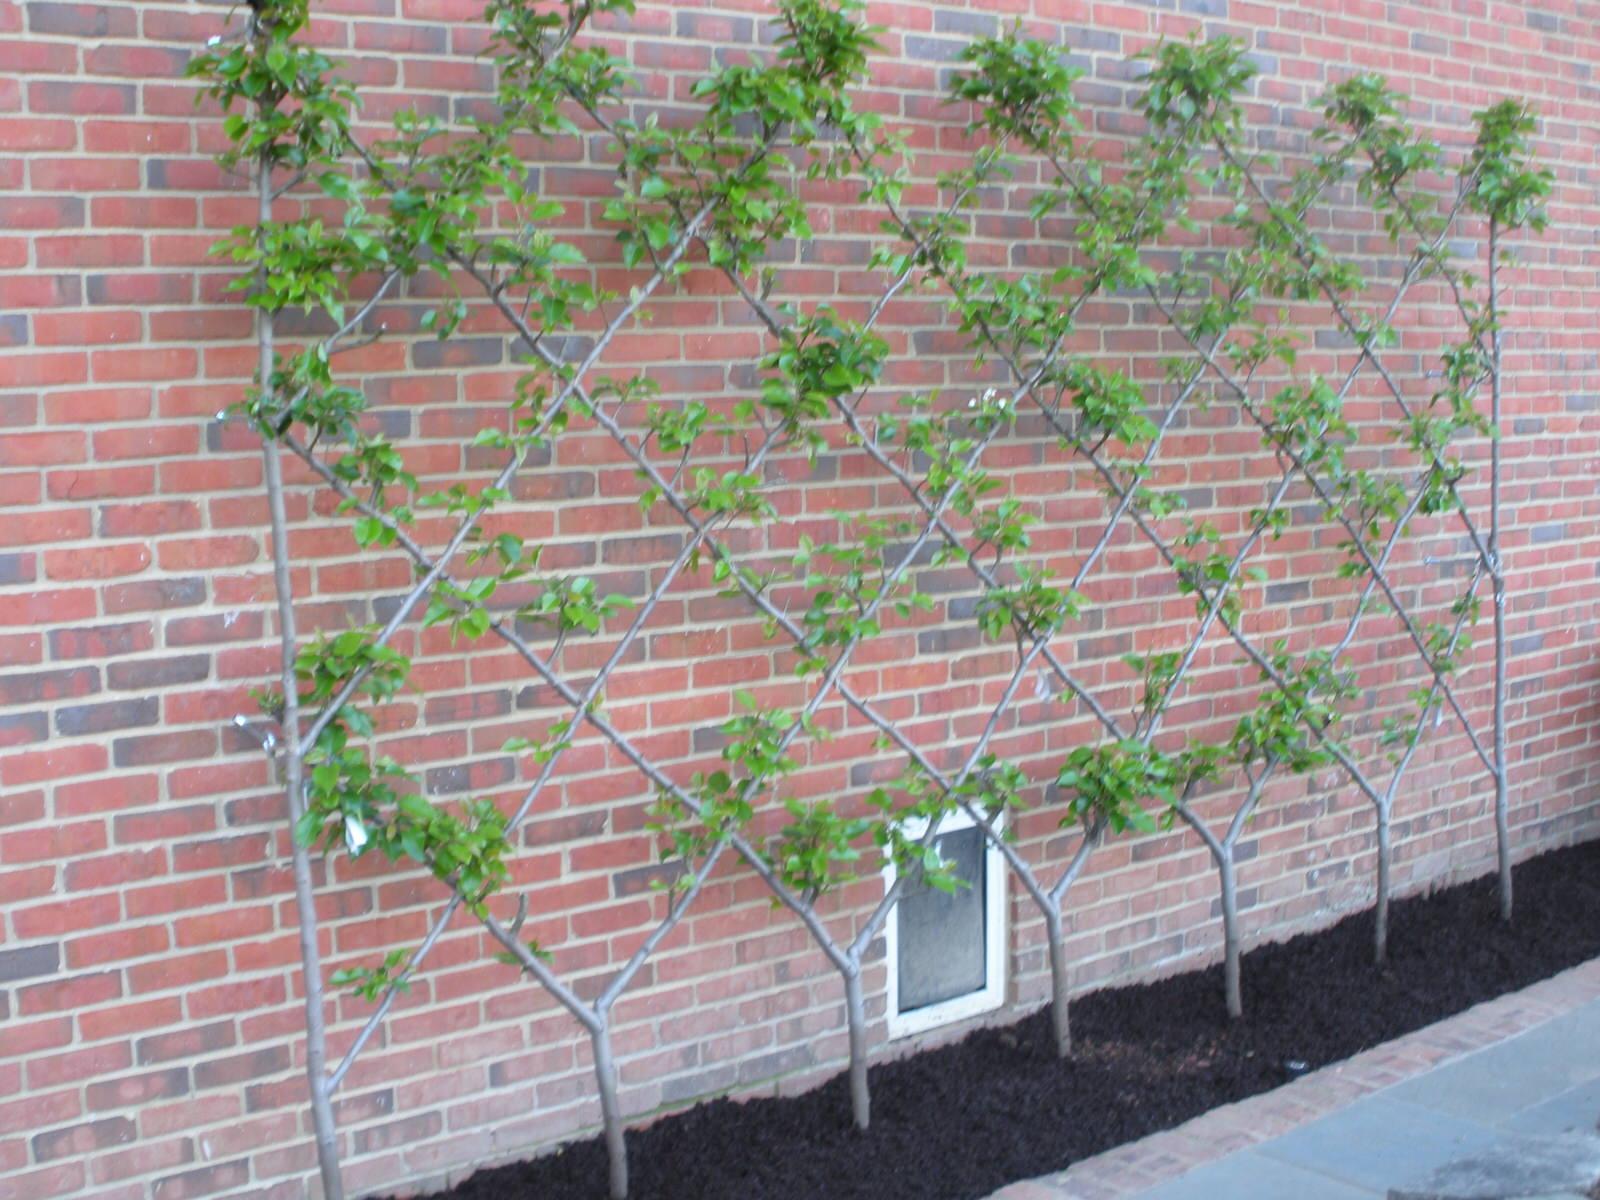 Justin Stelter Landscape Gardening - Espalier Installations - 3775657020_a896b74ac6_o.jpg